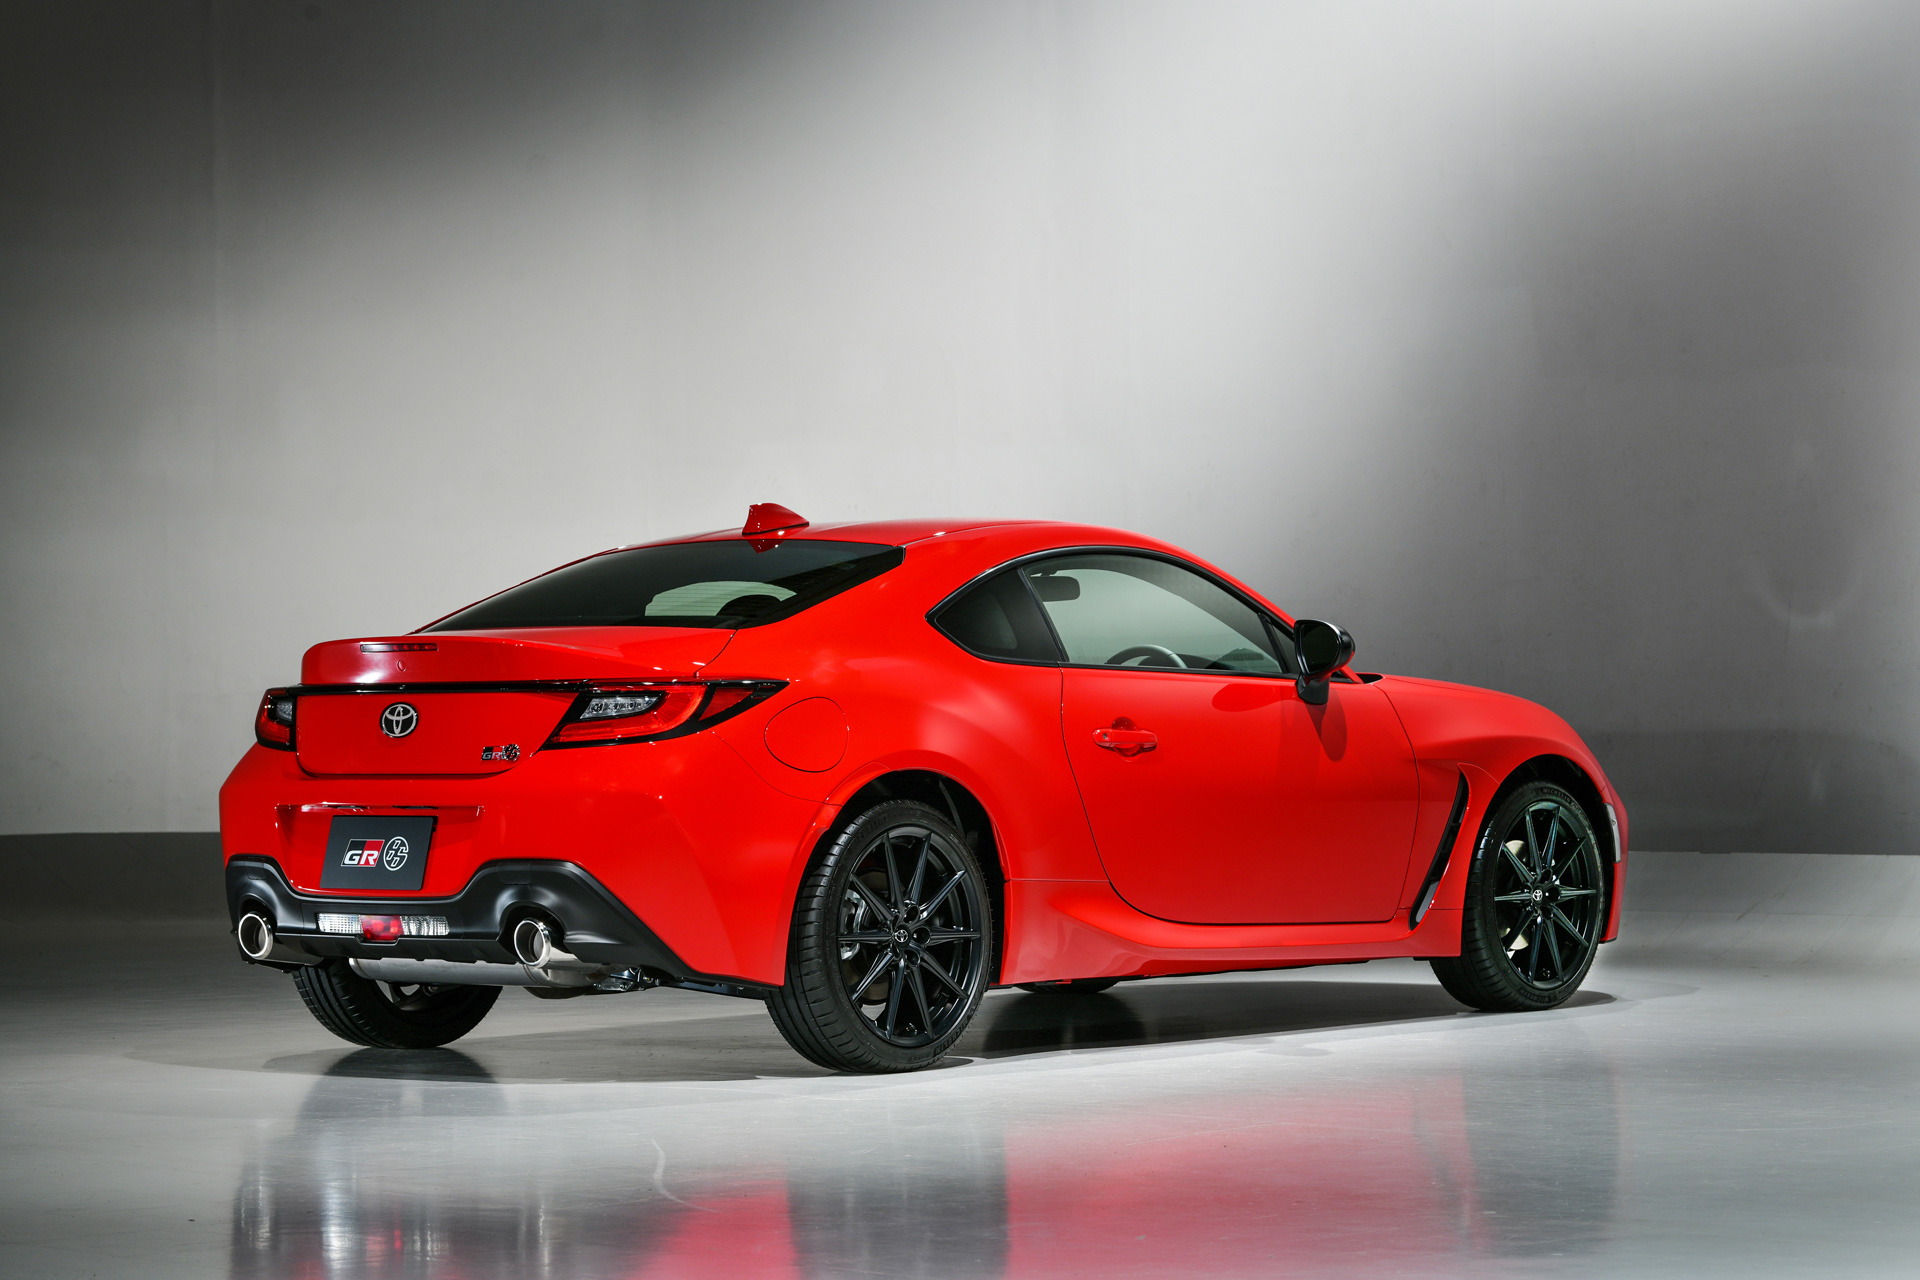 2021 Toyota GR 86 rear